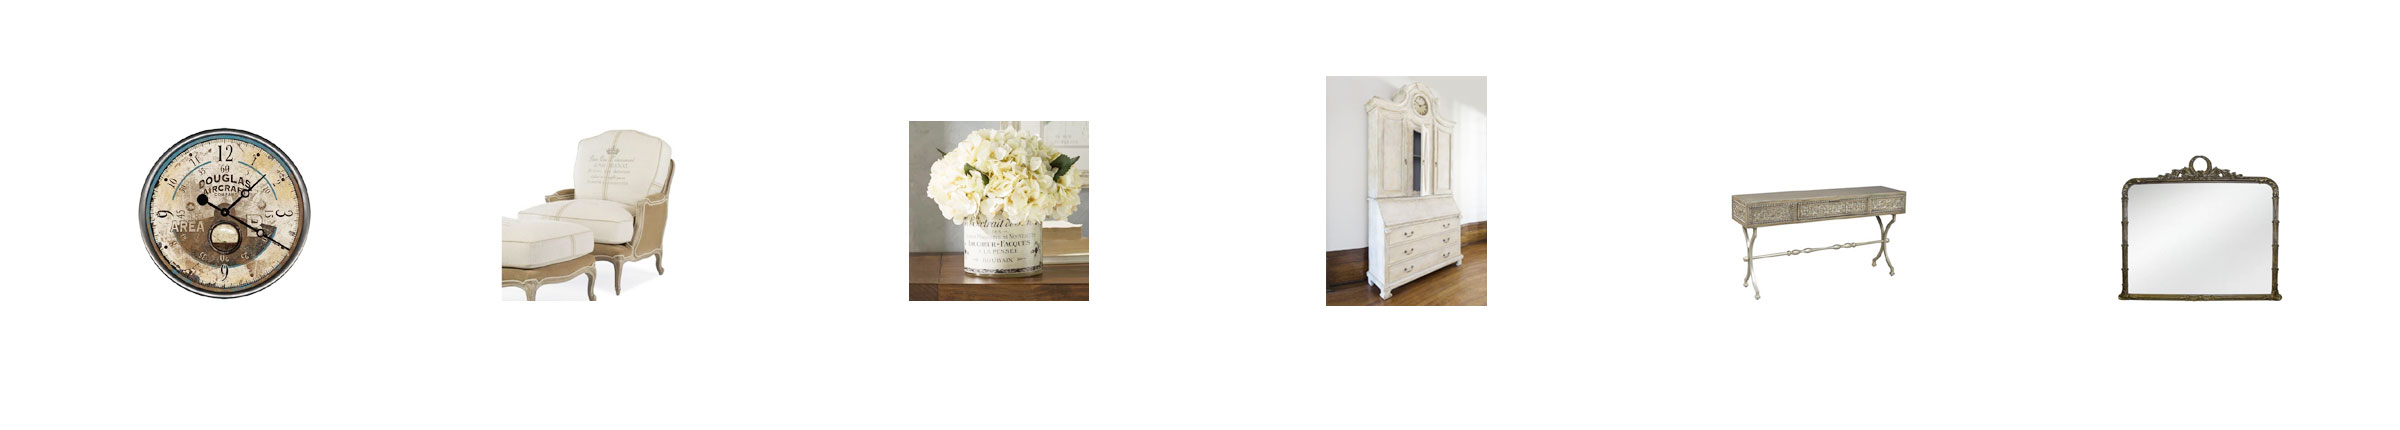 vintage furnishings & accessories